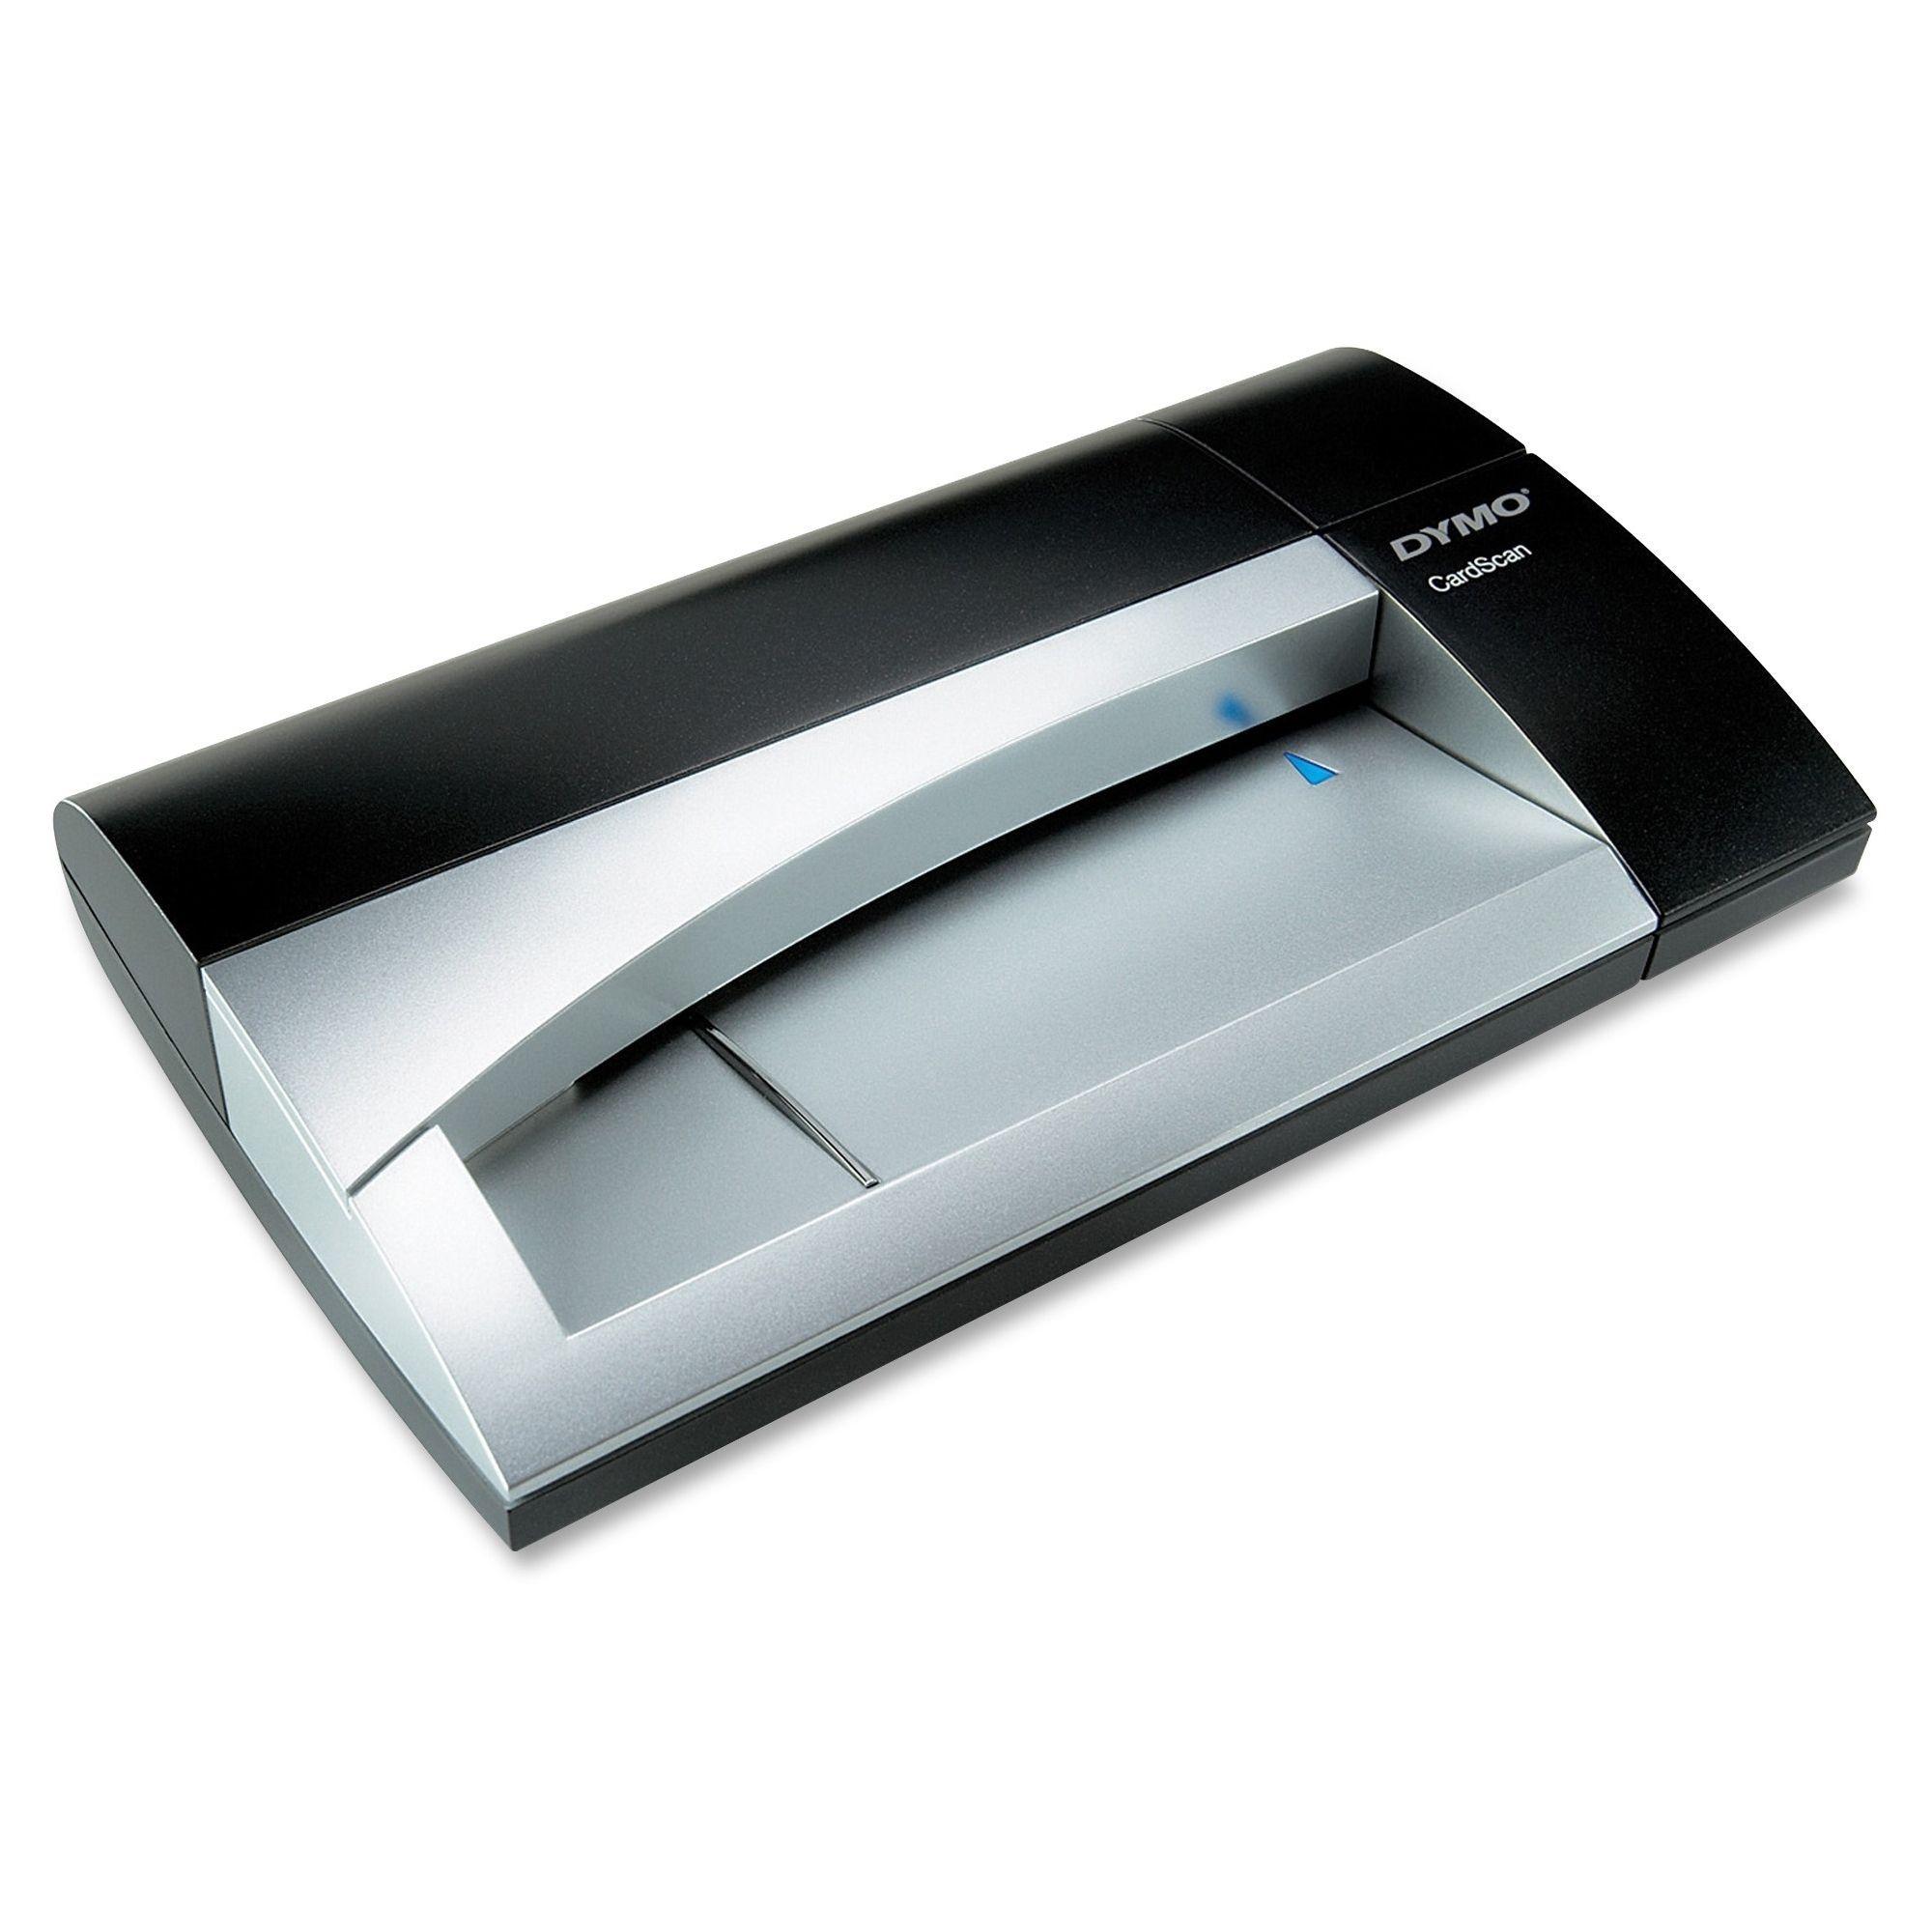 Dymo CardScan Team Card Scanner #1760687   Scanners   Pinterest